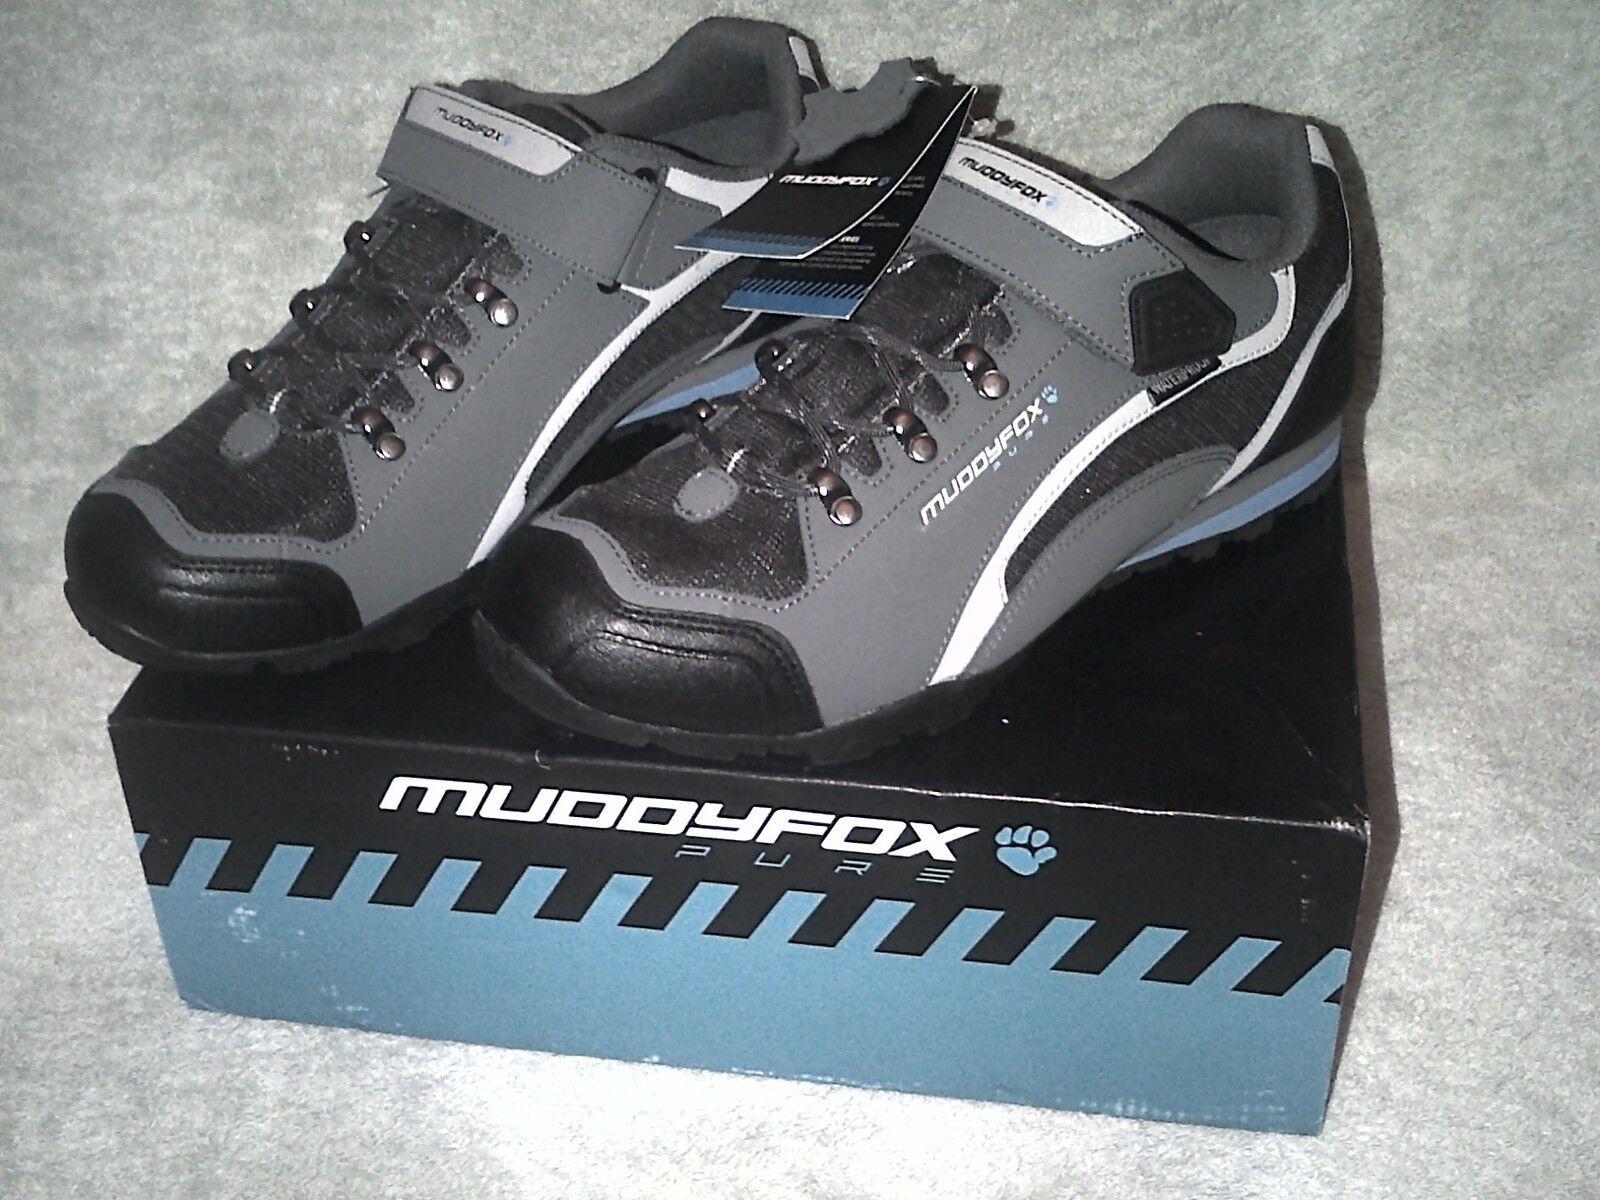 MUDDYFOX TOUR 200 LOW CYCLING Schuhe AND SIZE 10 CHARCOAL GREY AND Schuhe Blau d34a6a